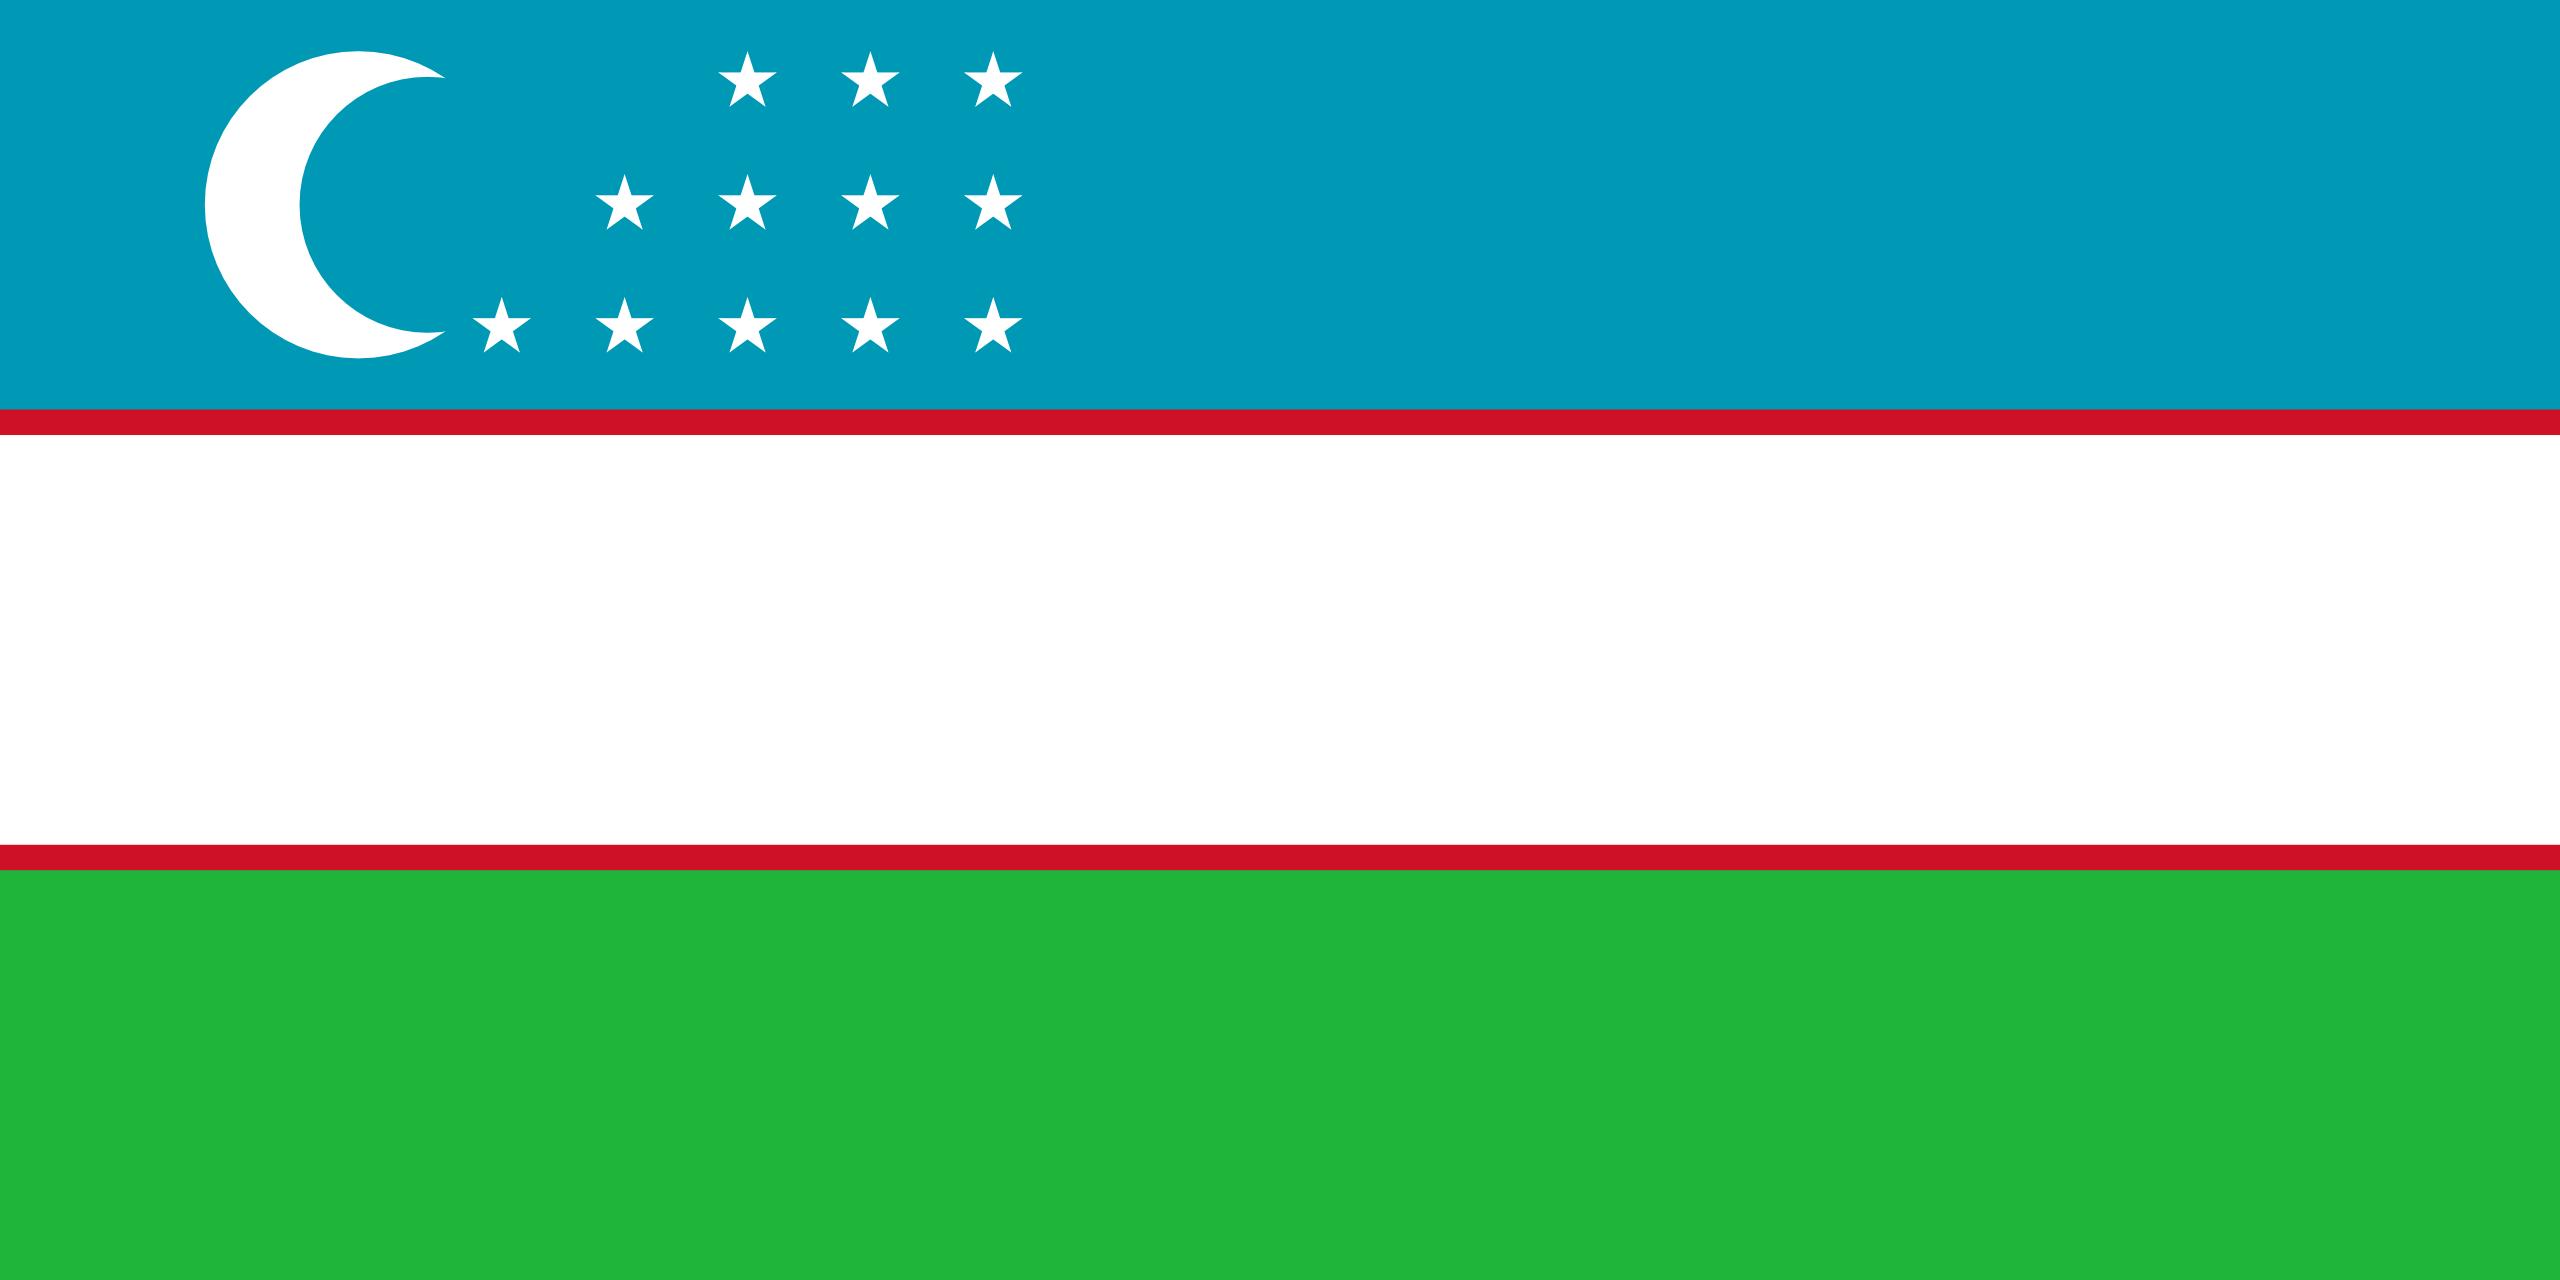 Uzbekistan, paese, emblema, logo, simbolo - Sfondi HD - Professor-falken.com